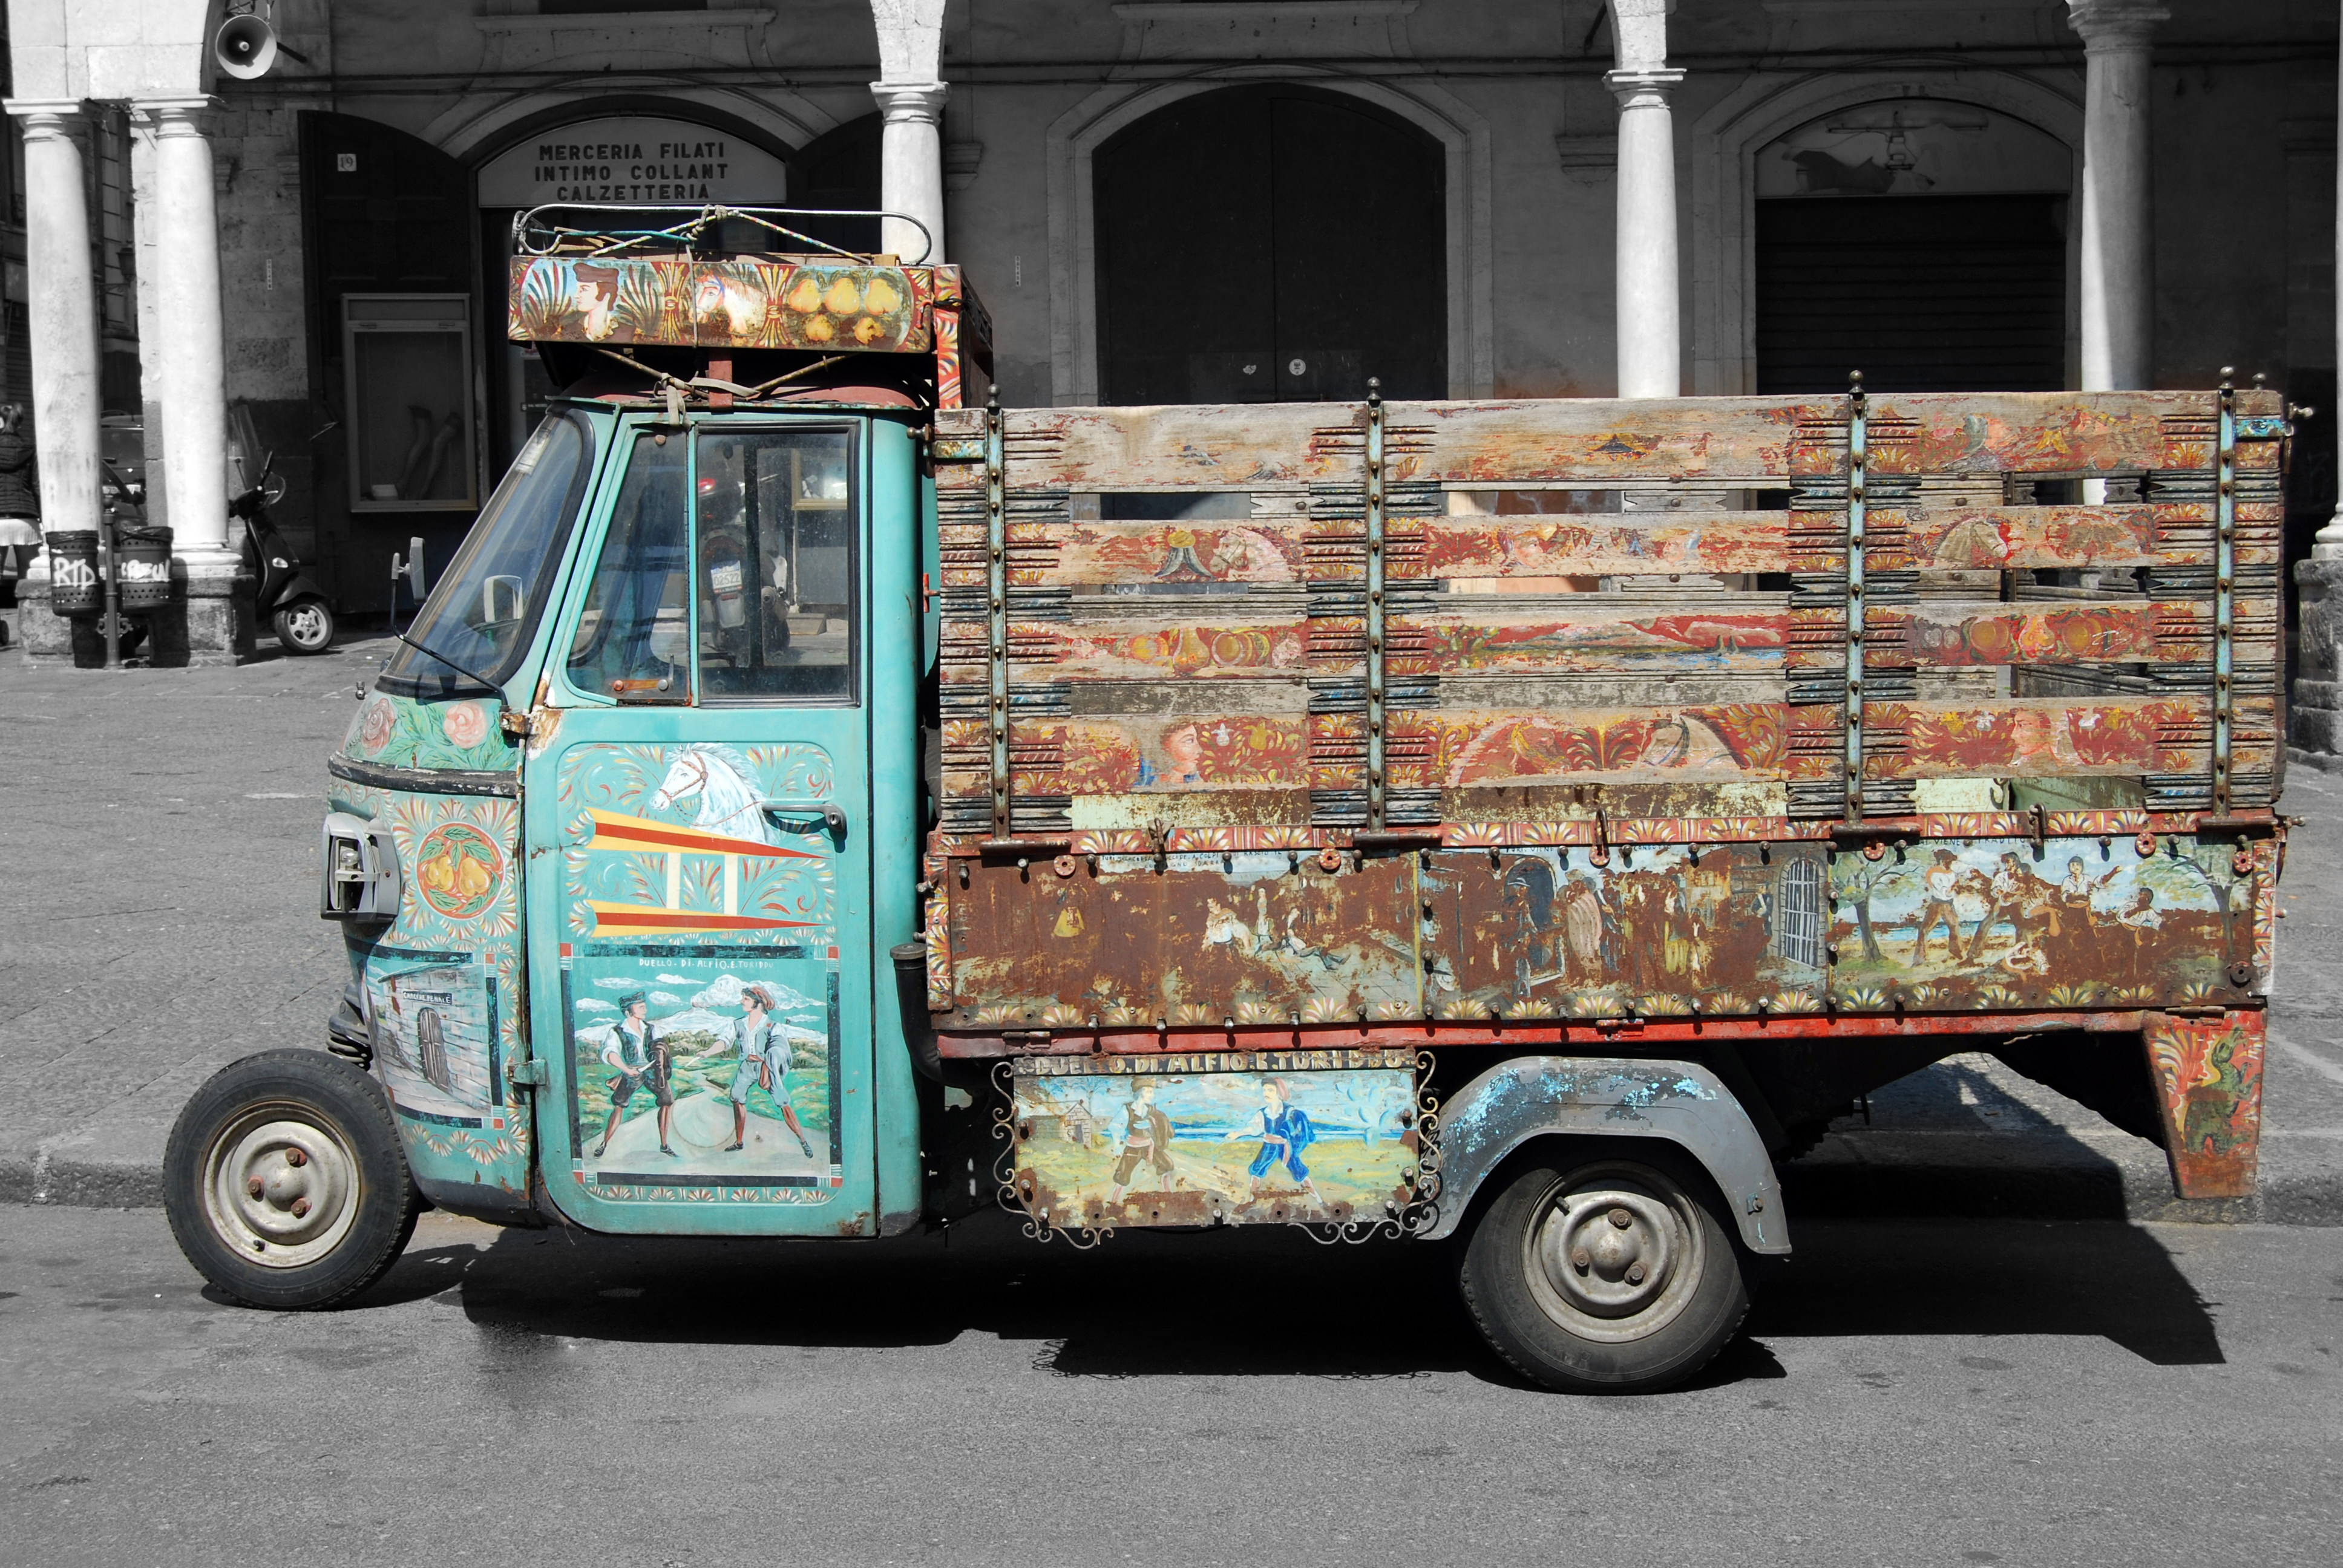 Rickshaw on the Road, Auto, City, Rickshaw, Ride, HQ Photo